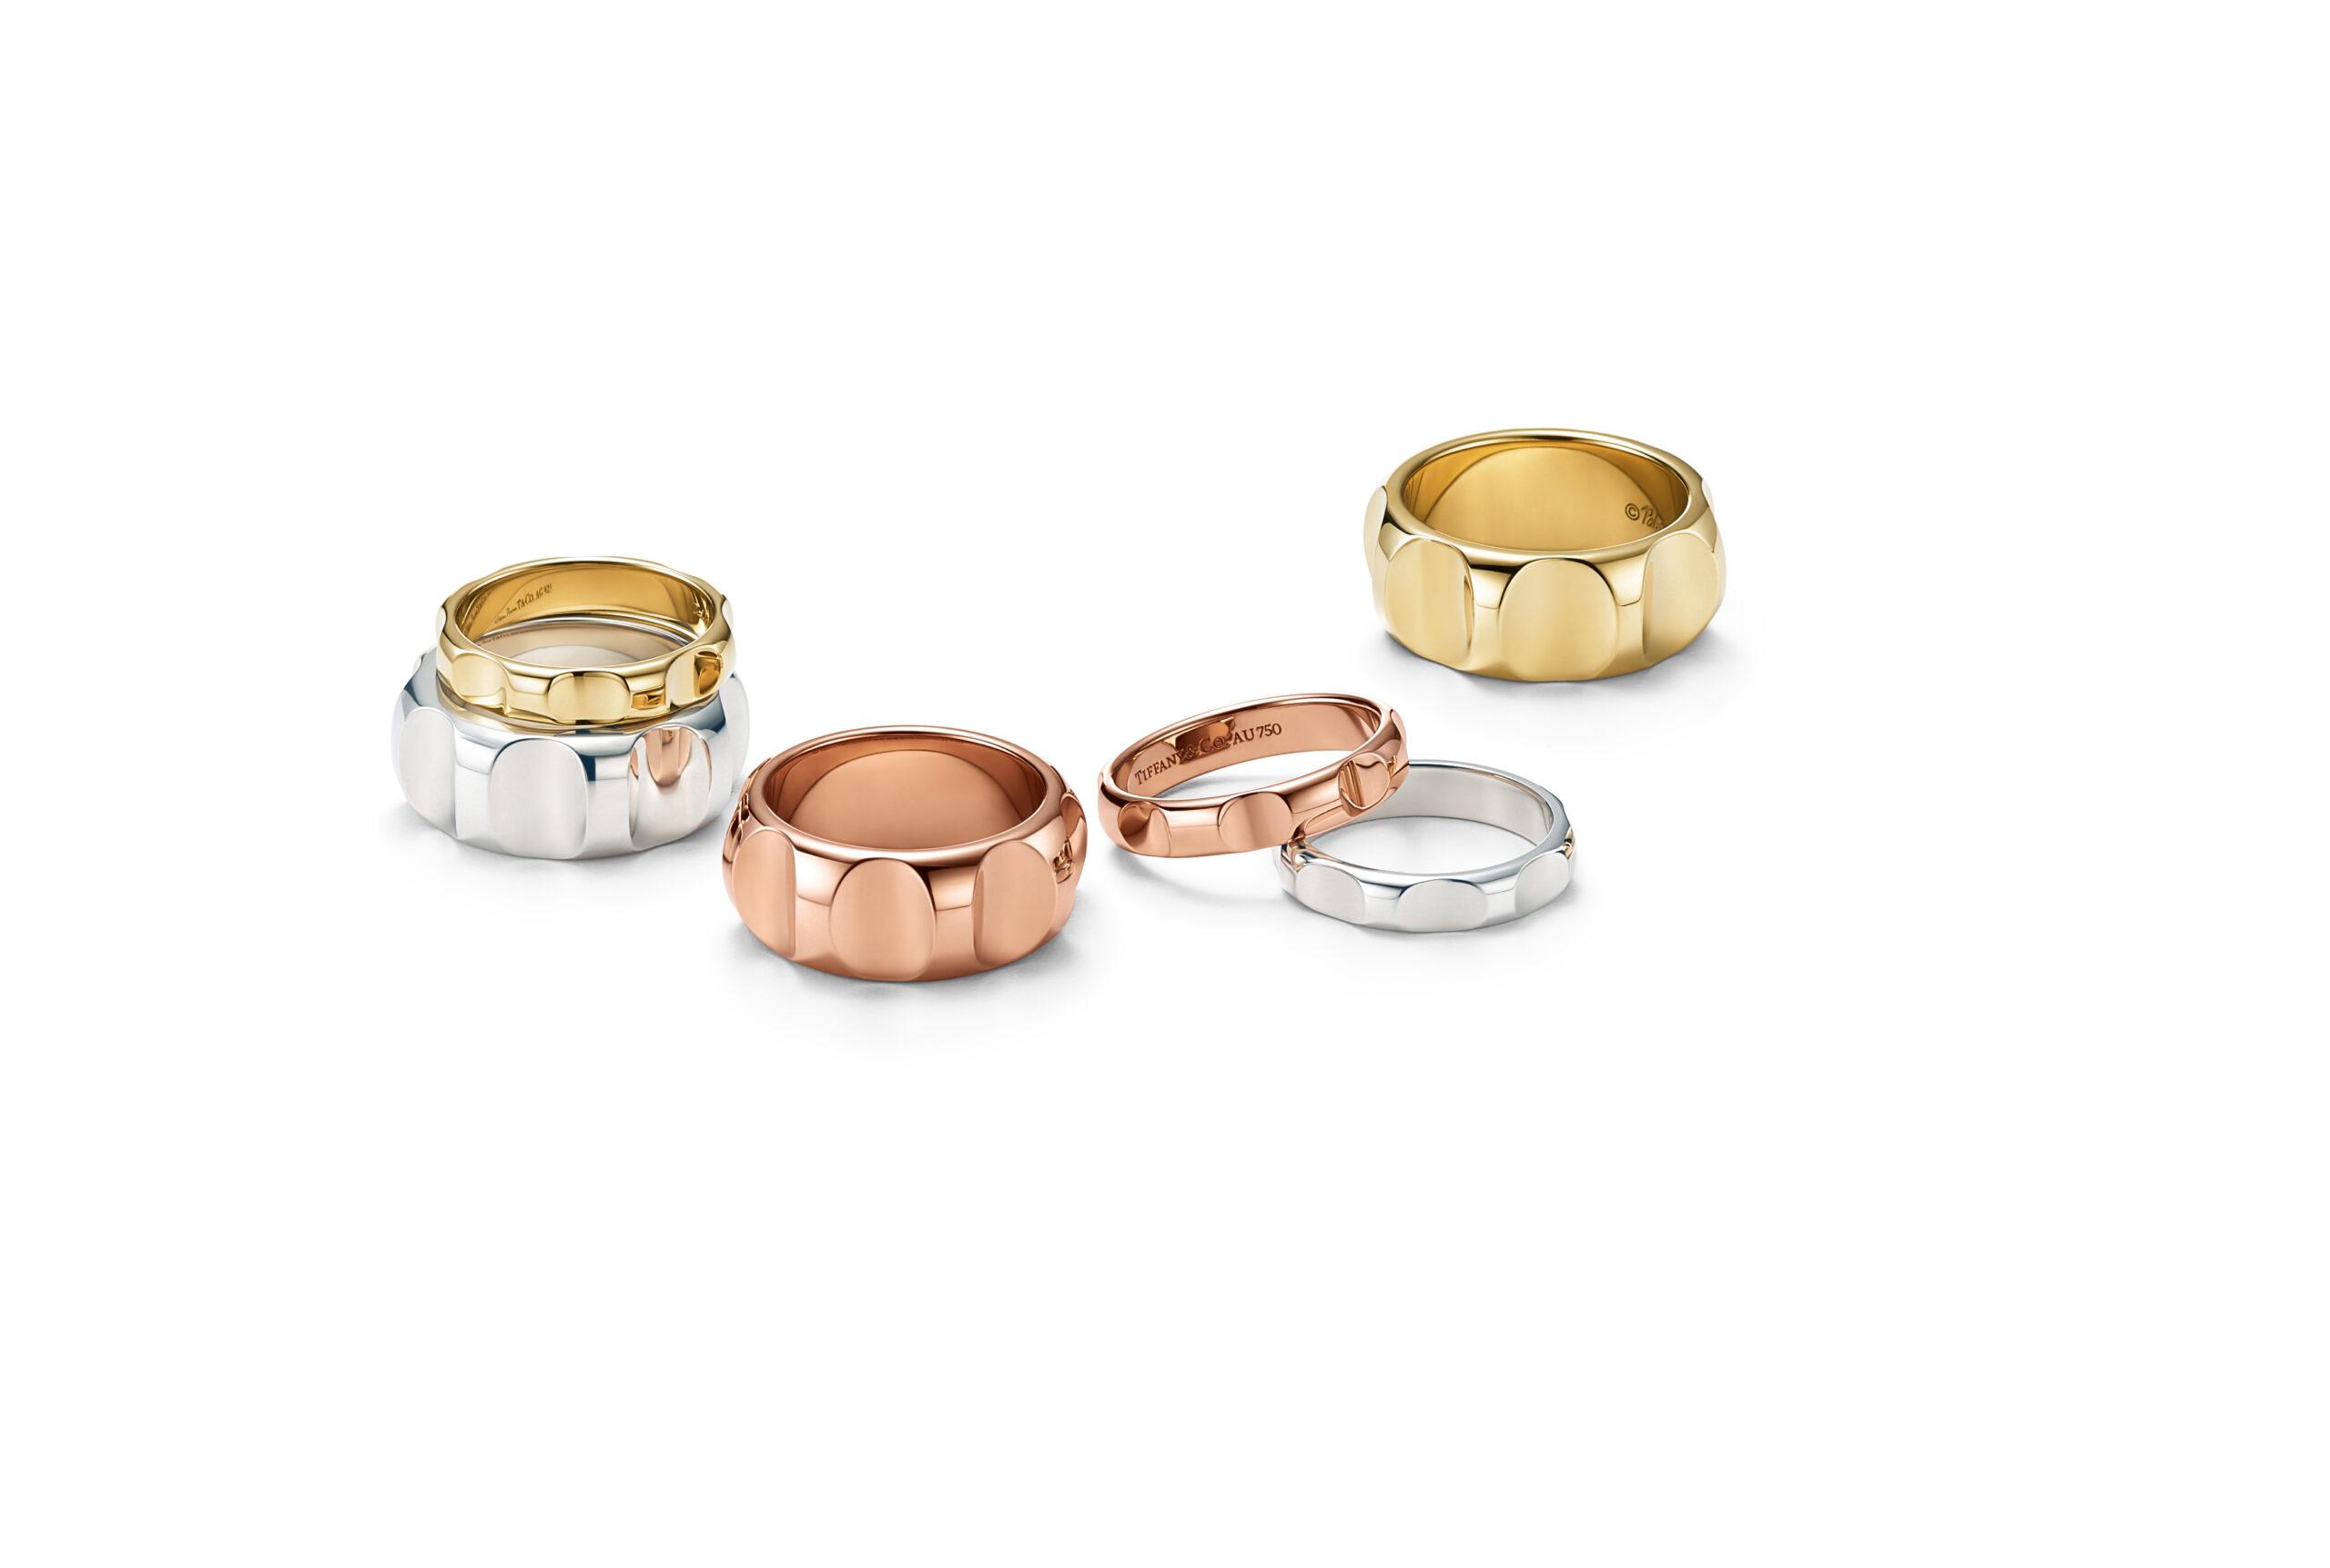 Tiffany Paloma's Groove™ rings